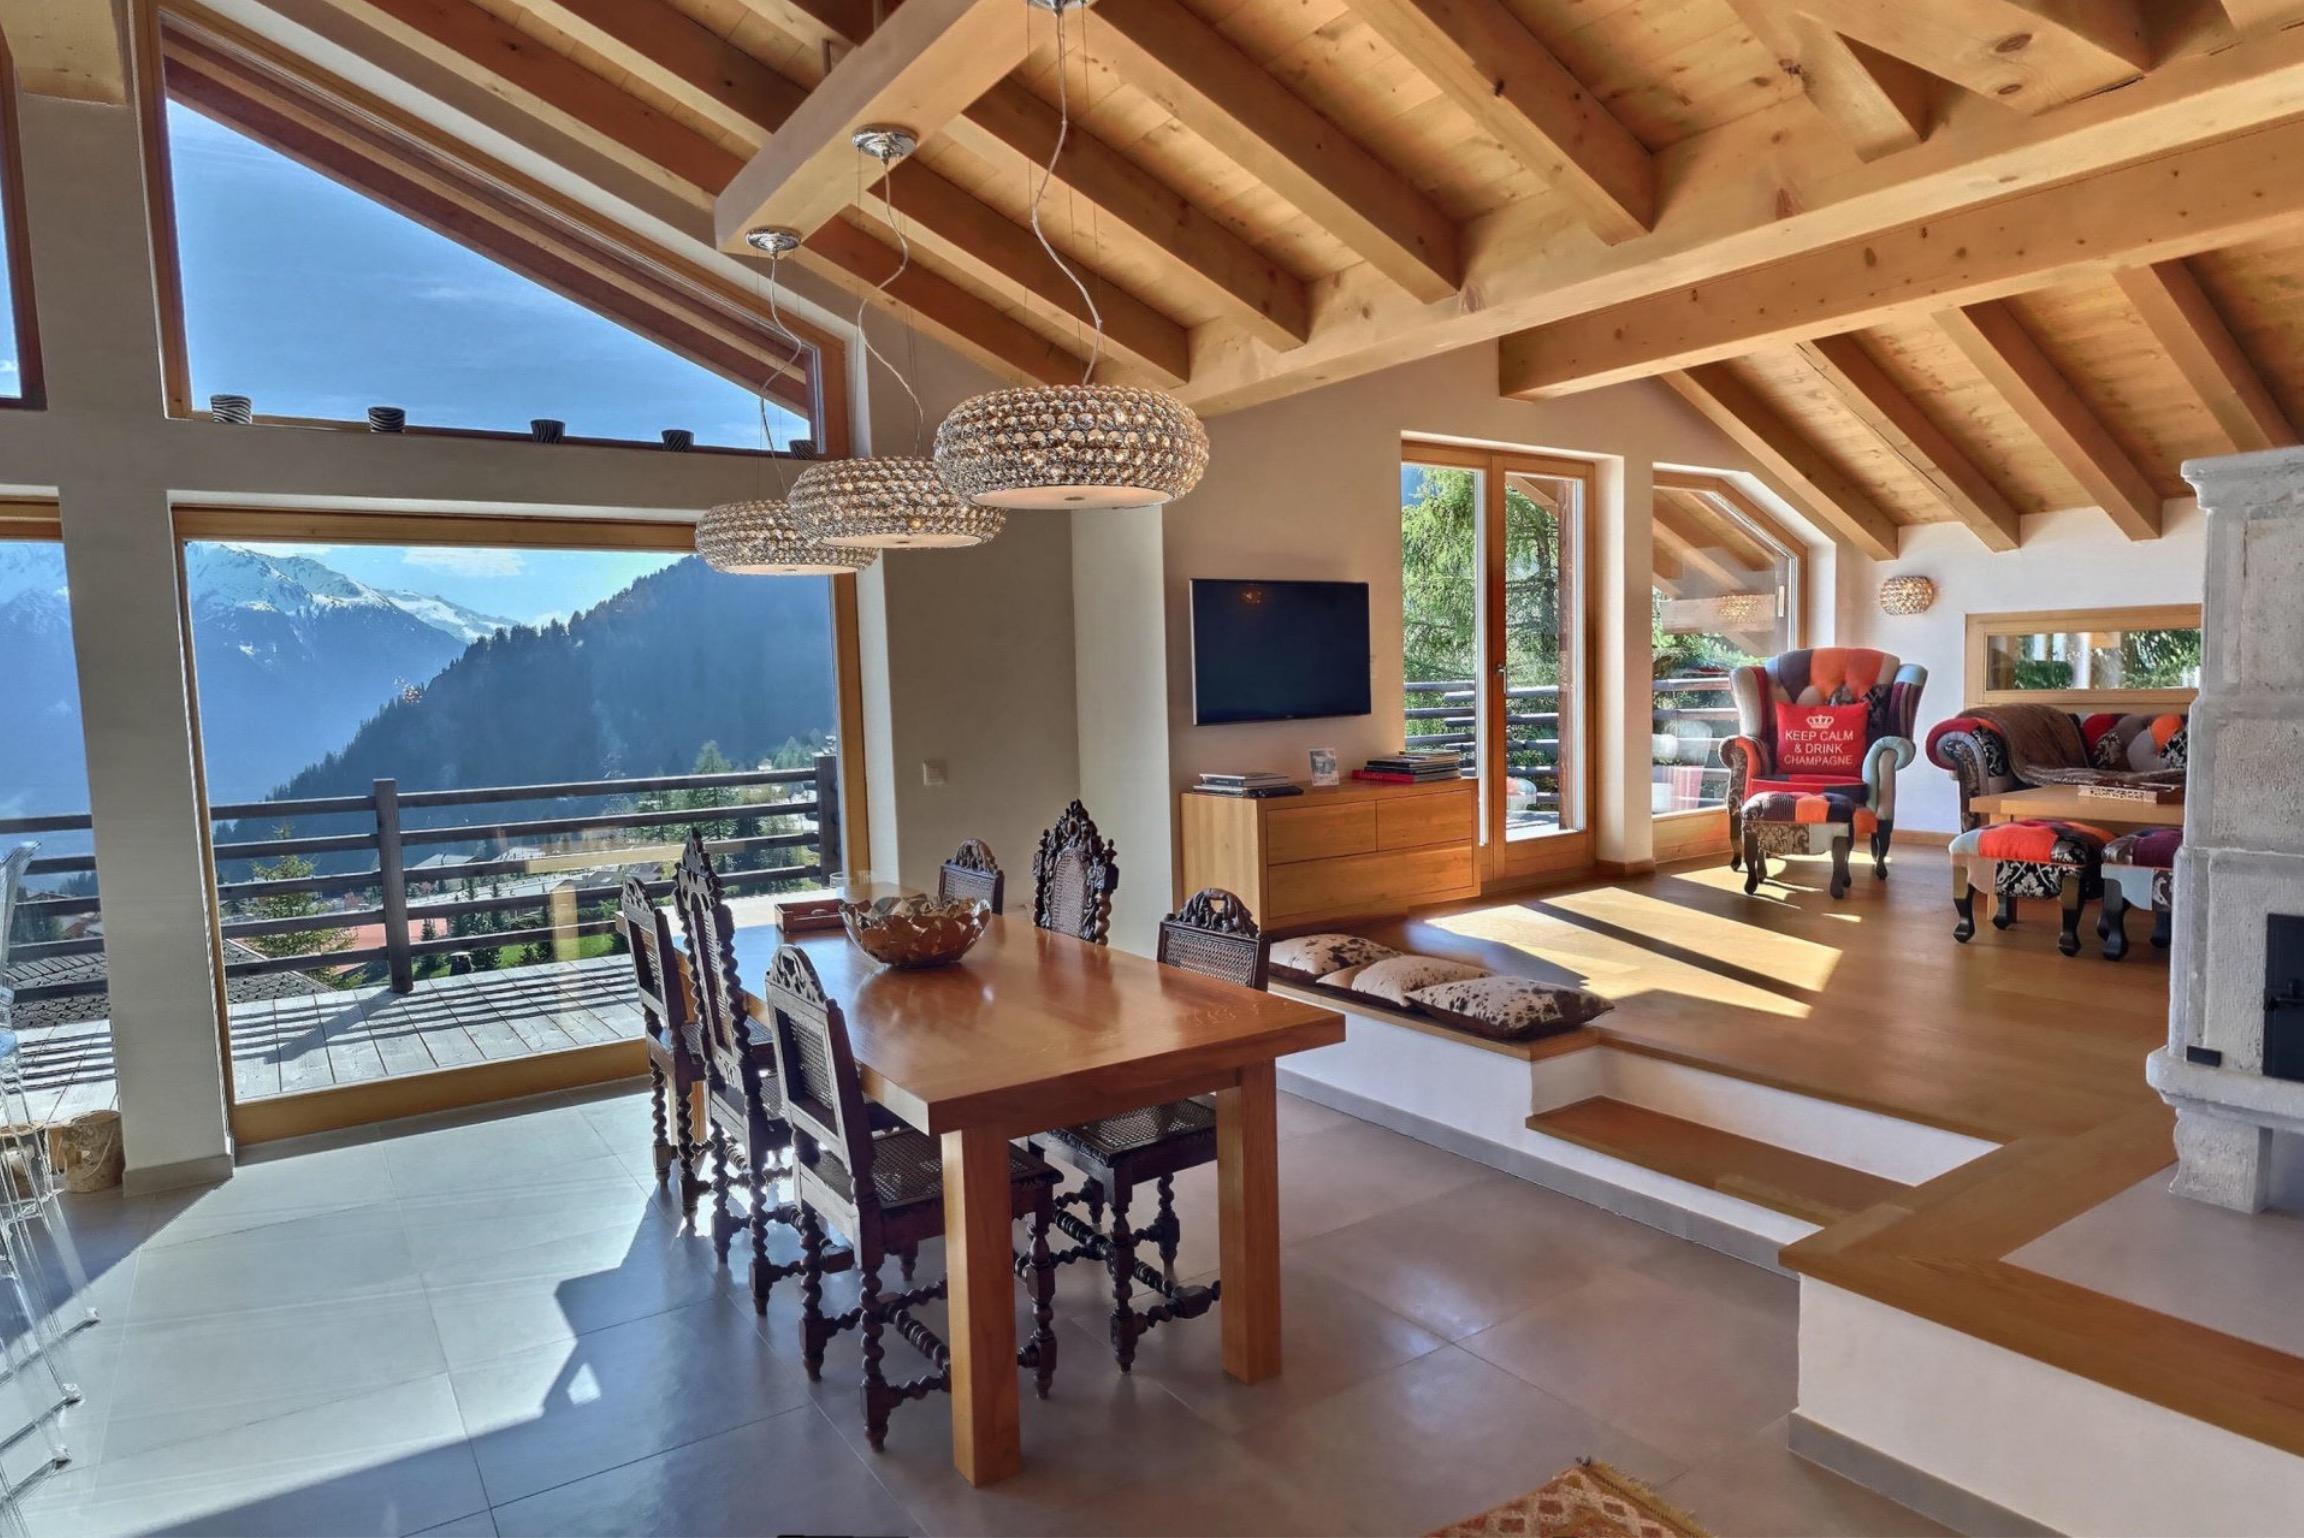 Chalet IV verbier livingroom and outside seen